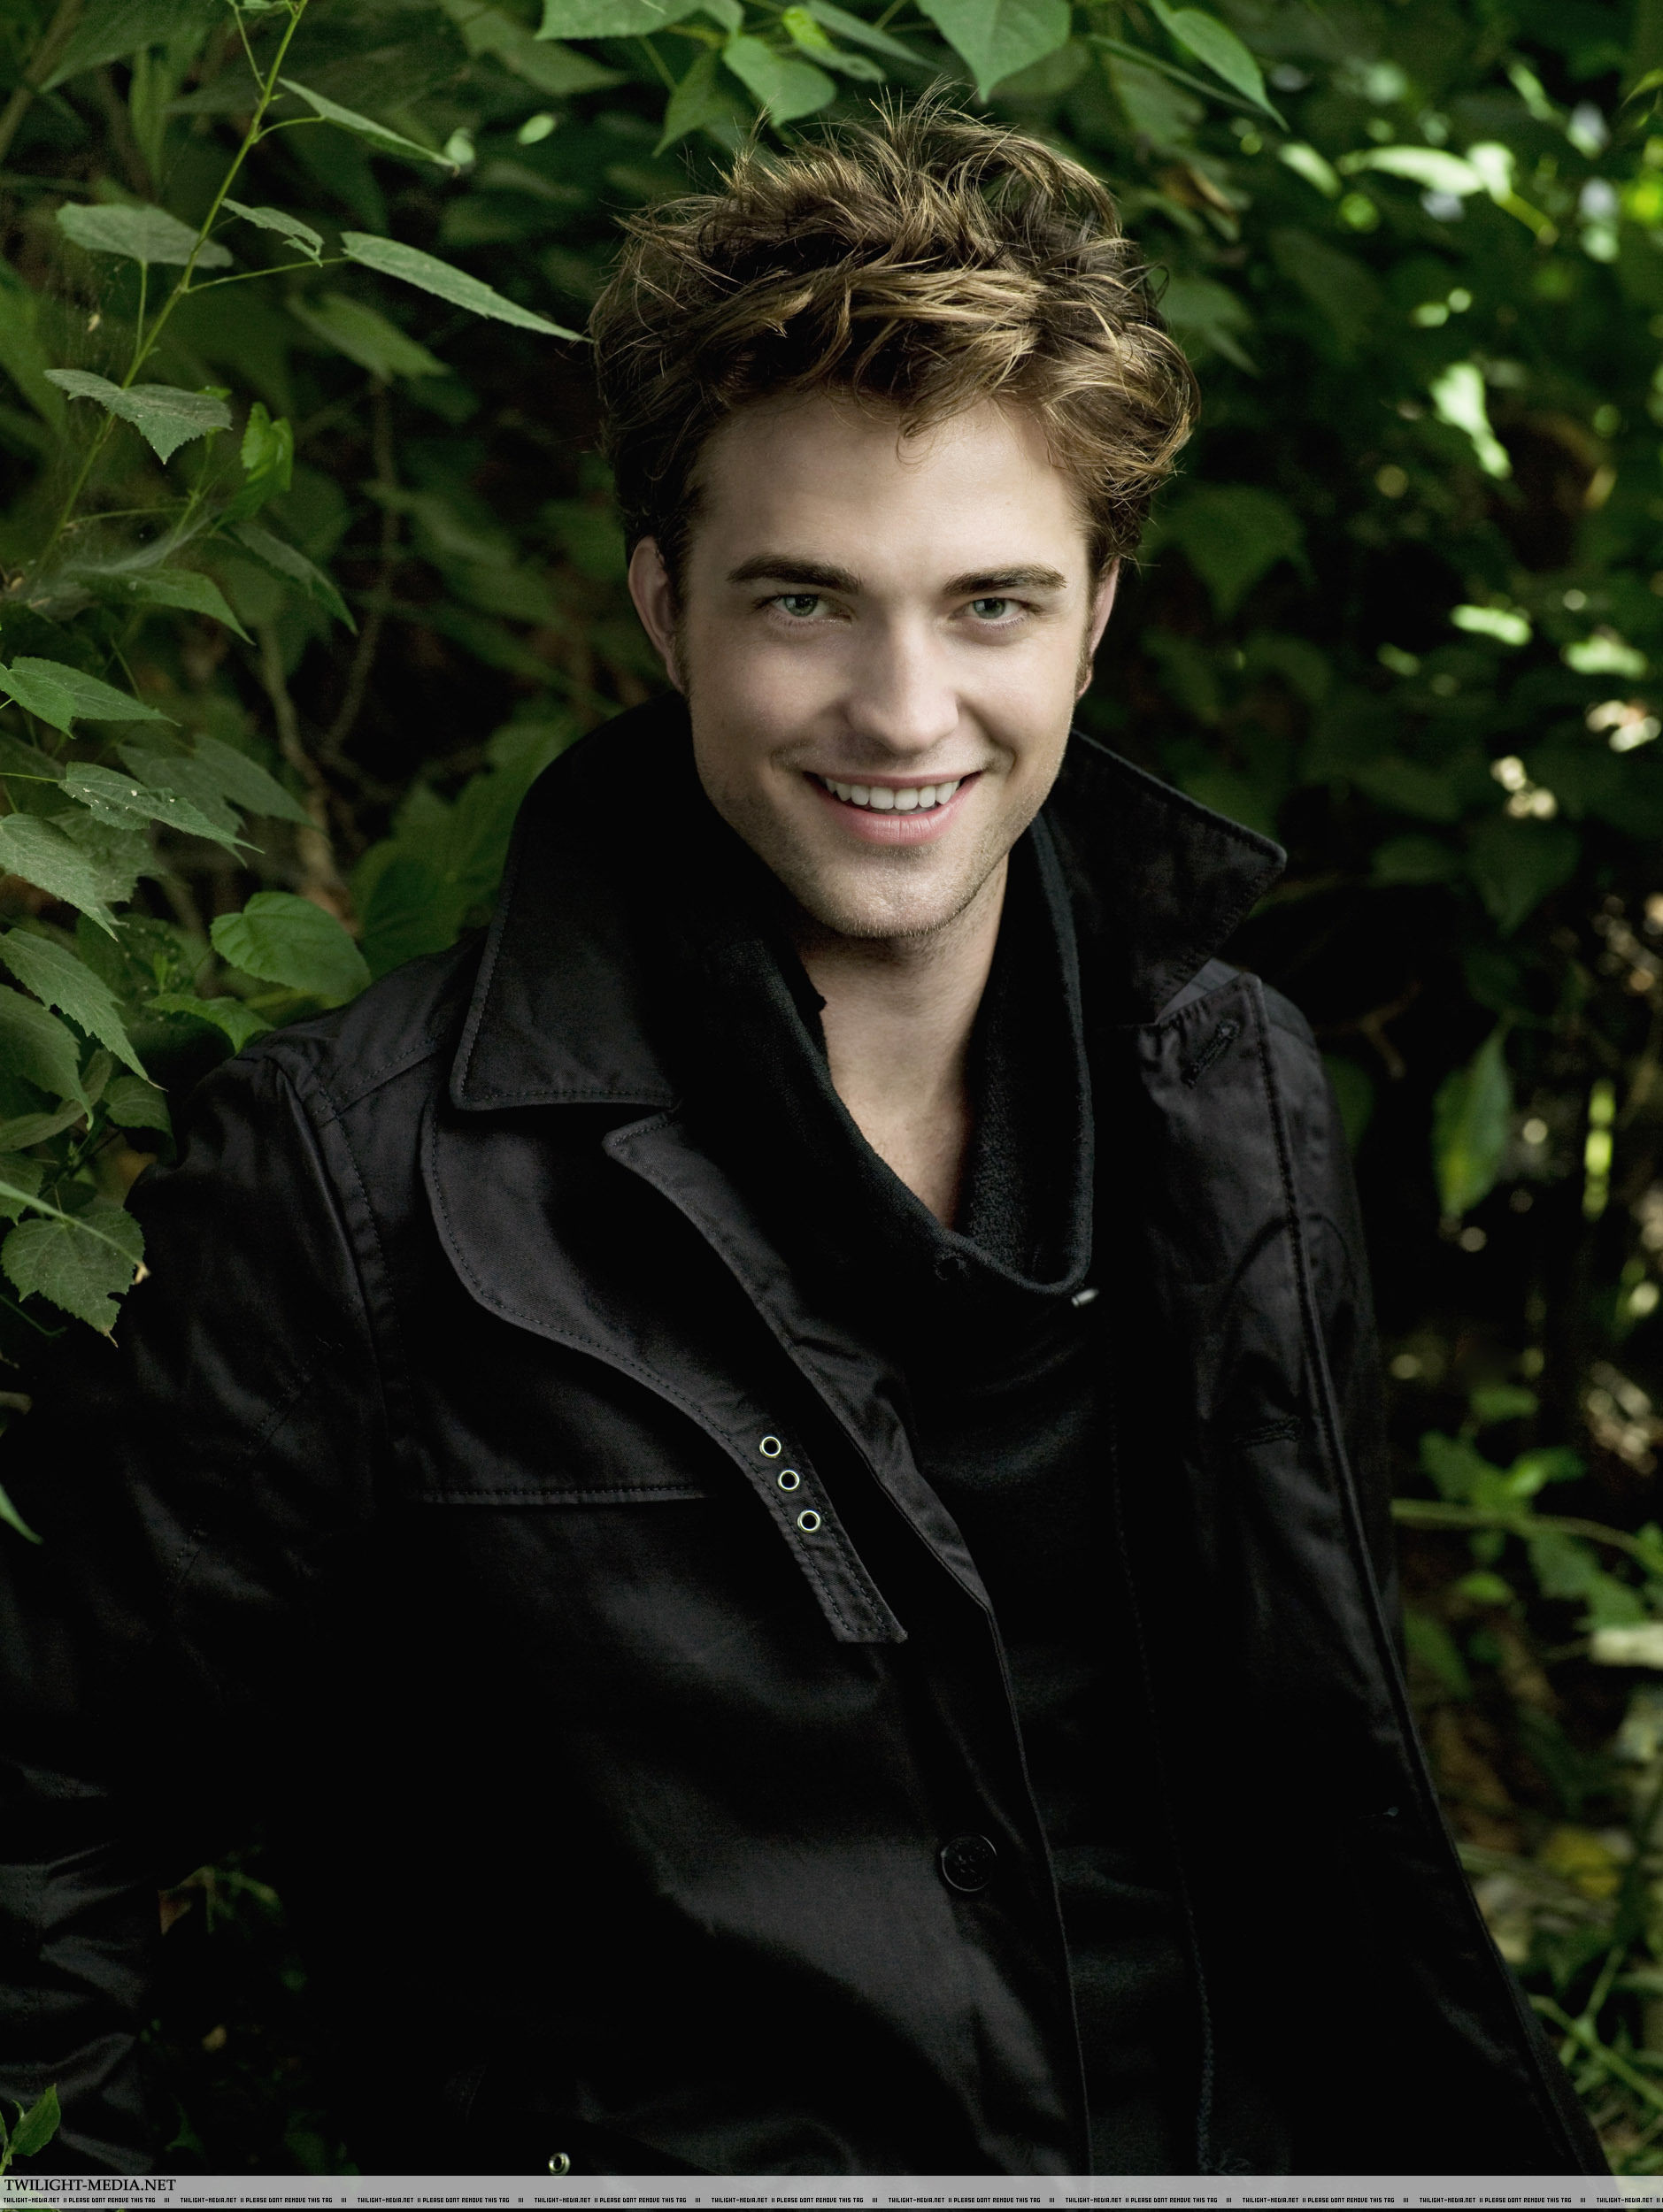 Robert Pattinson twilight series 9587542 1879 2500 - polling for showbiz comp  November 2013